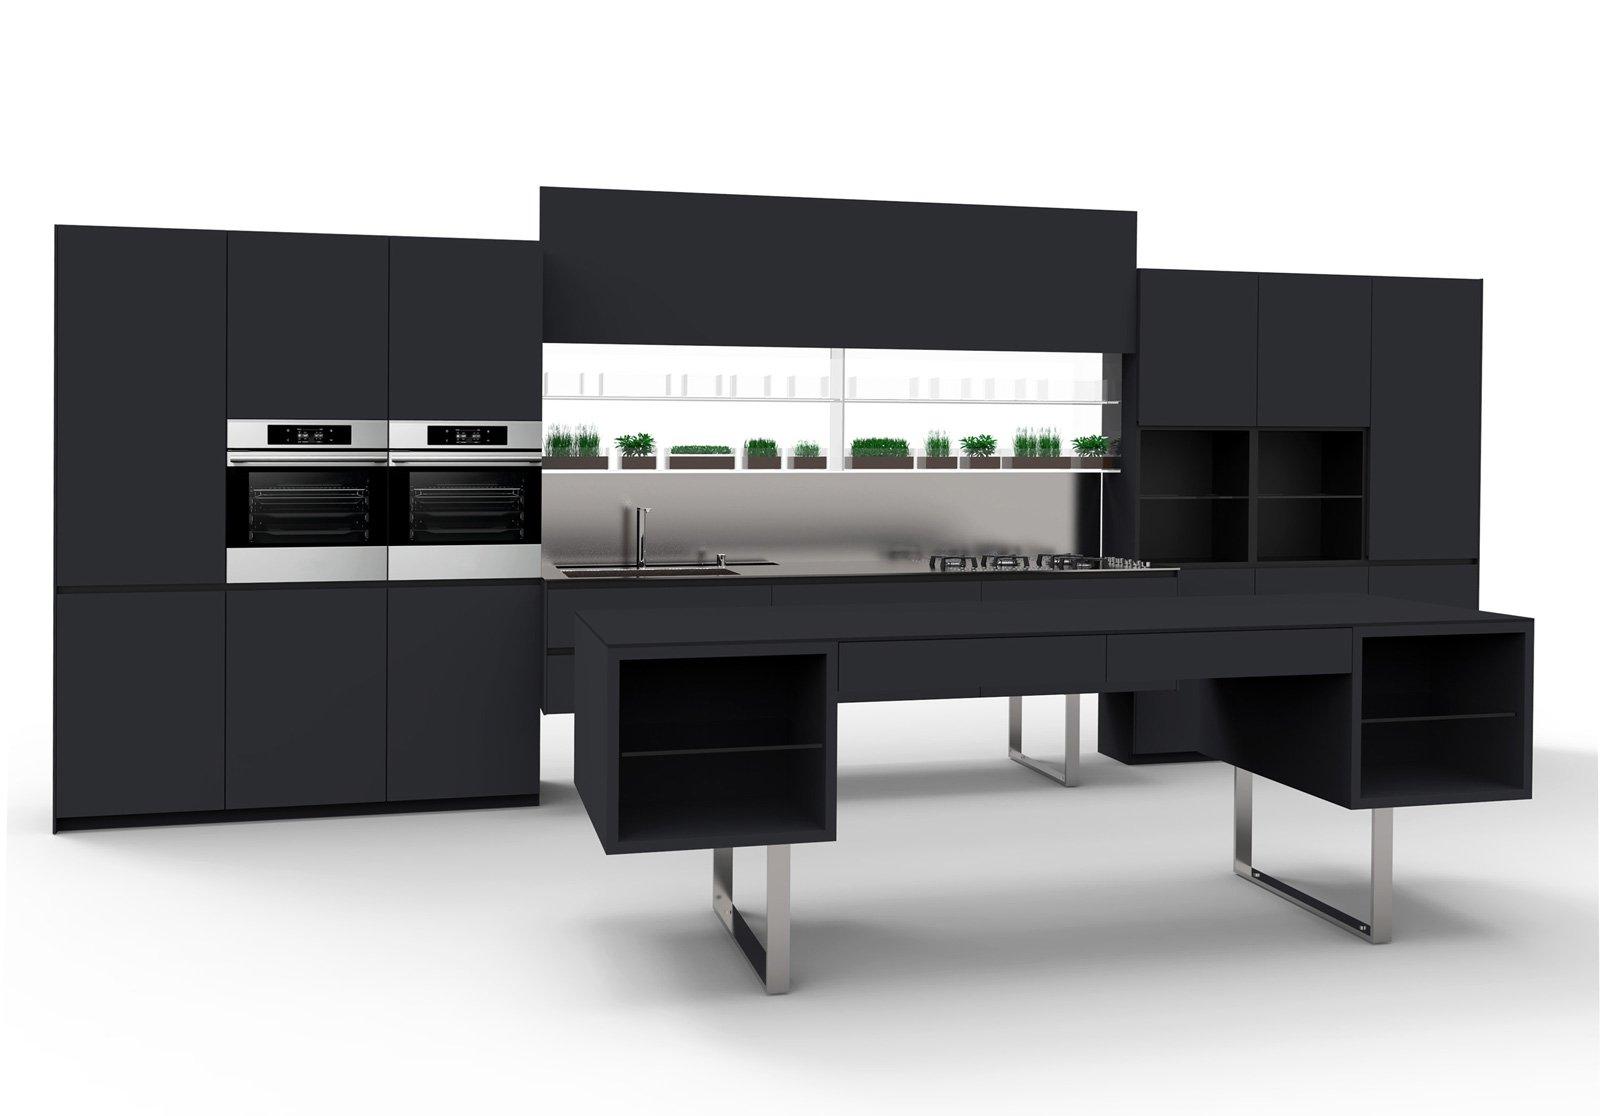 Cucine in grigio di inaspettata freschezza: novità Eurocucina in anteprima - Cose di Casa